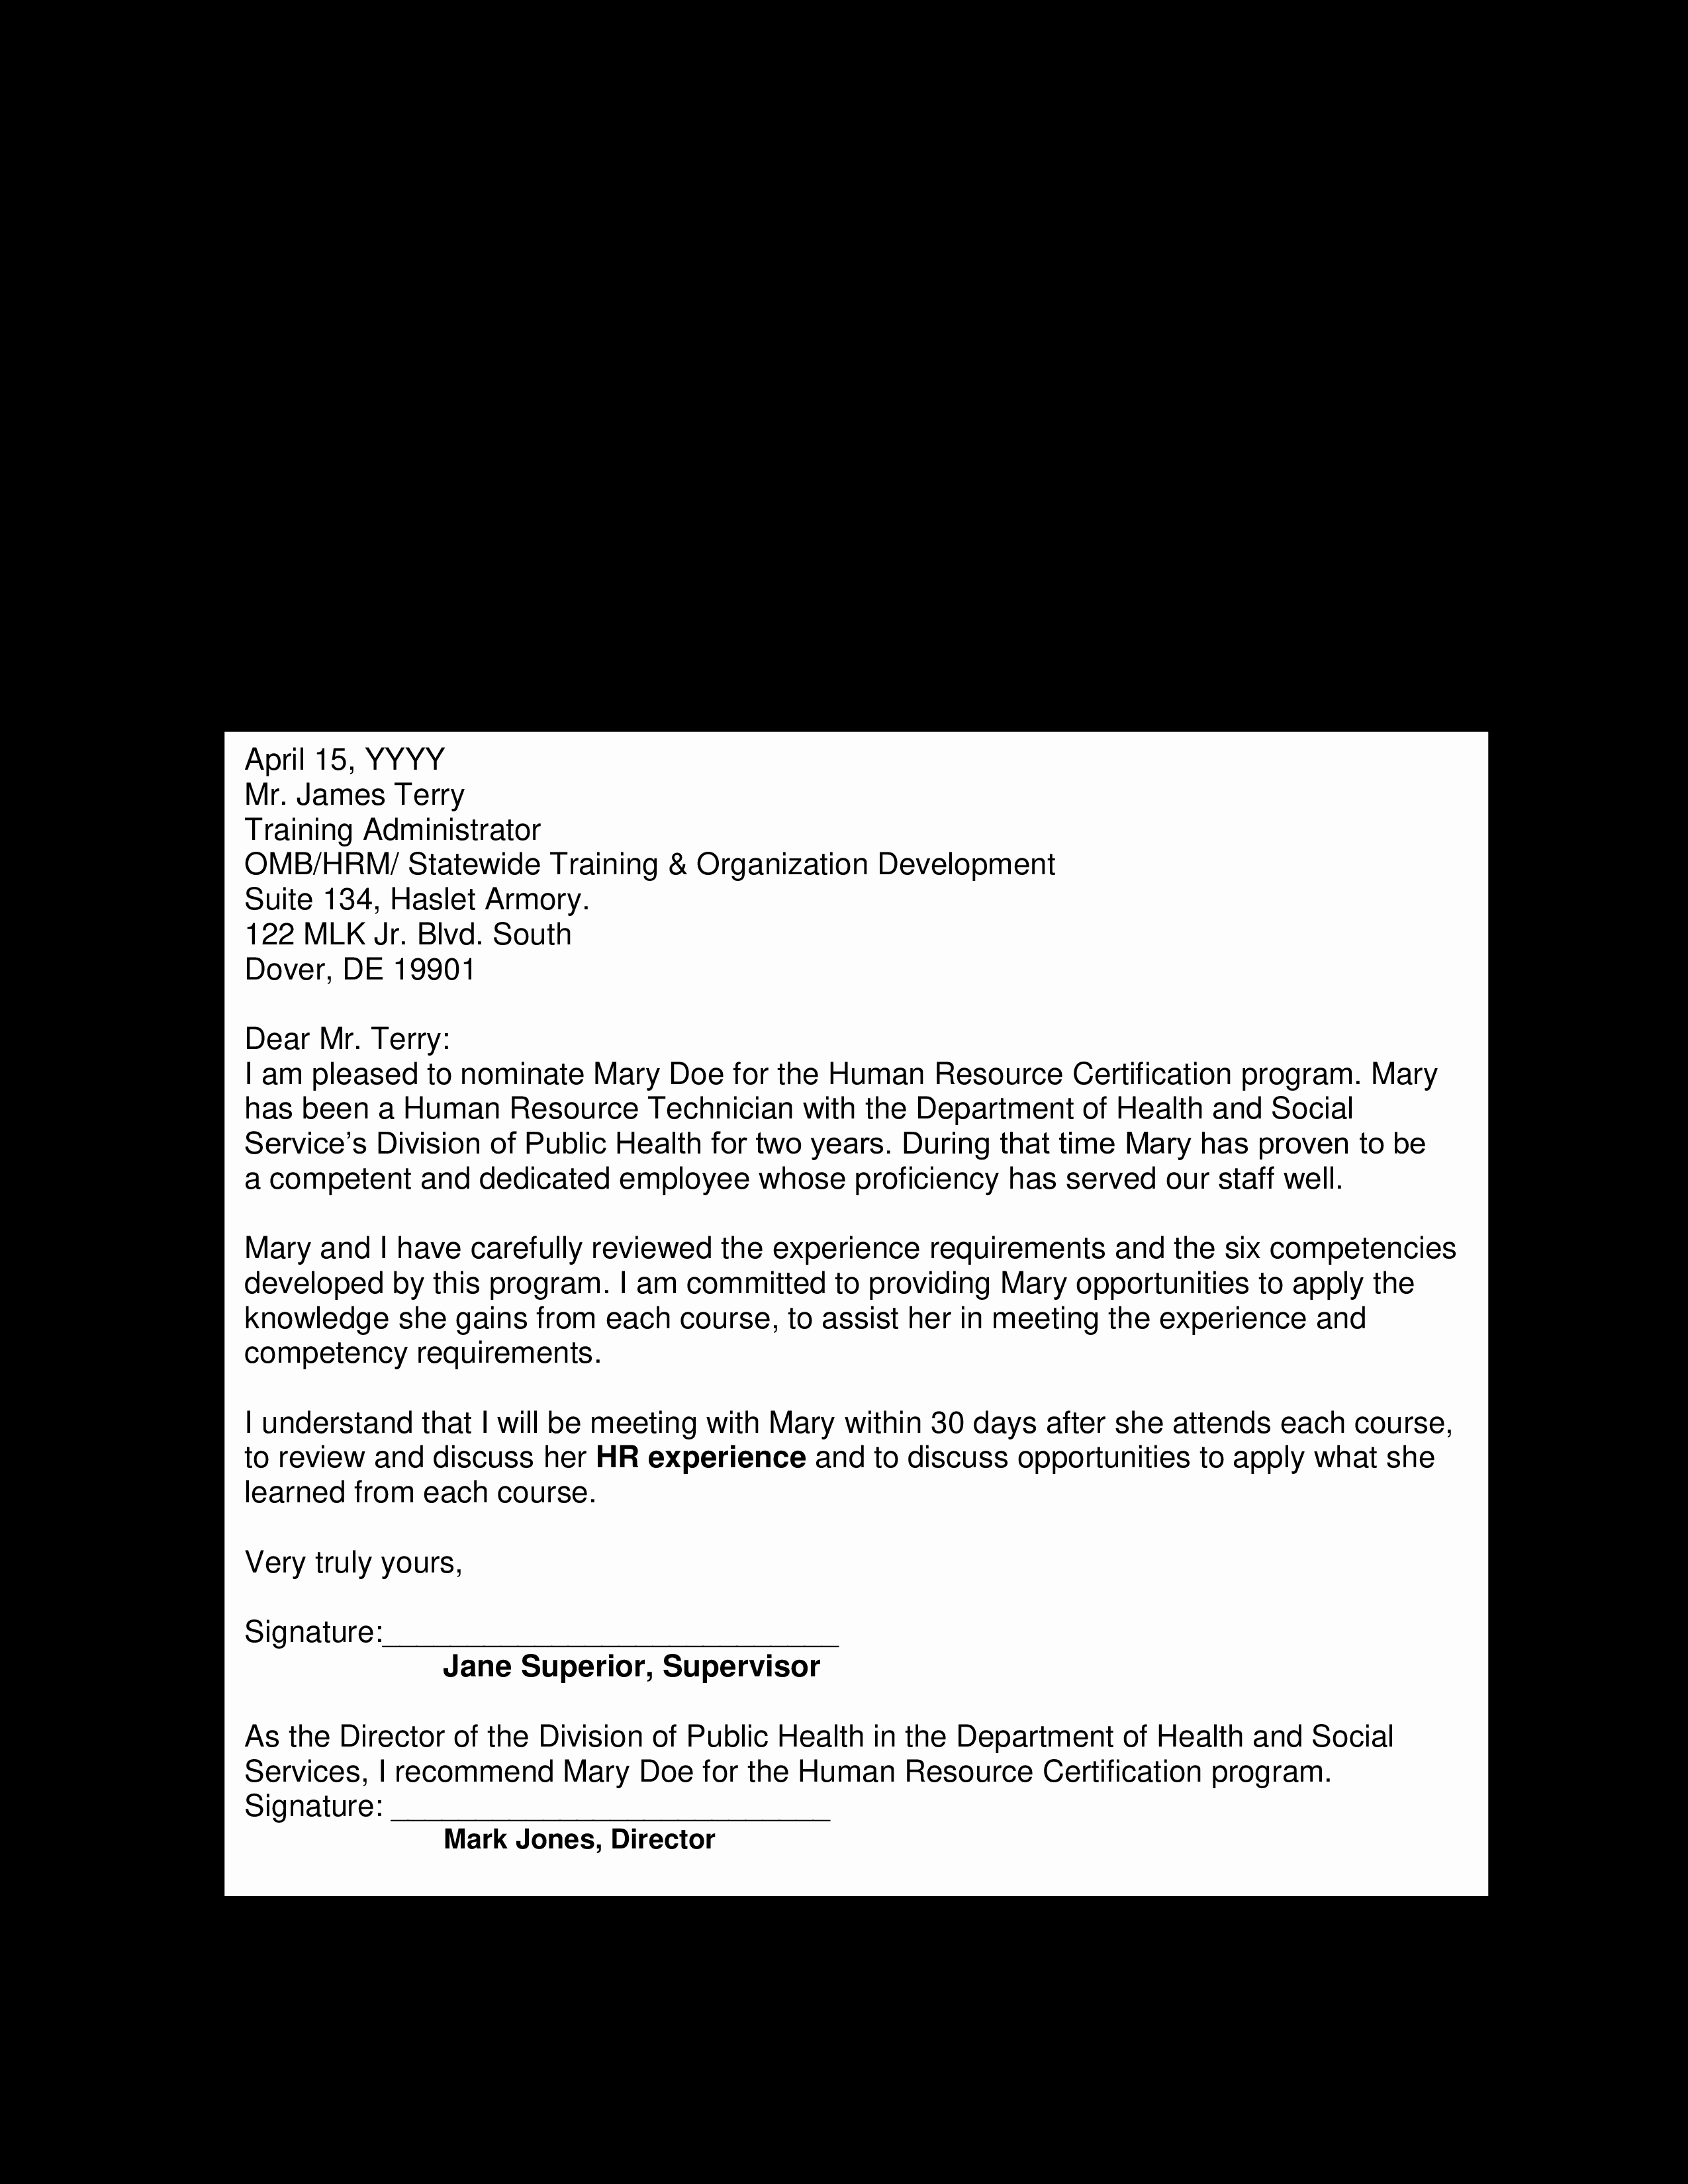 Short Recommendation Letter for Employee Awesome Free Short Letter Re Mendation for Employment